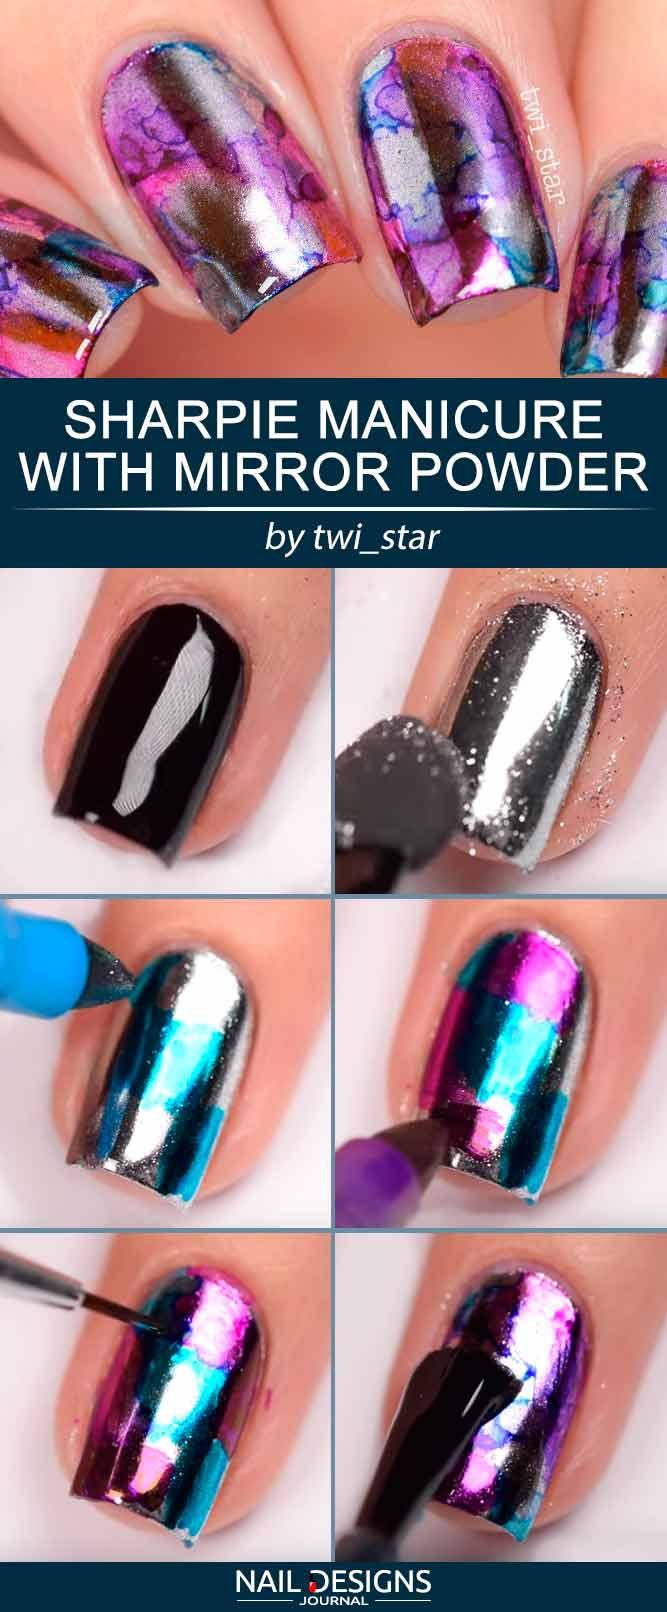 Sharpie Manicure With Mirror Powder #watercolornails #chromenails #mirrornails